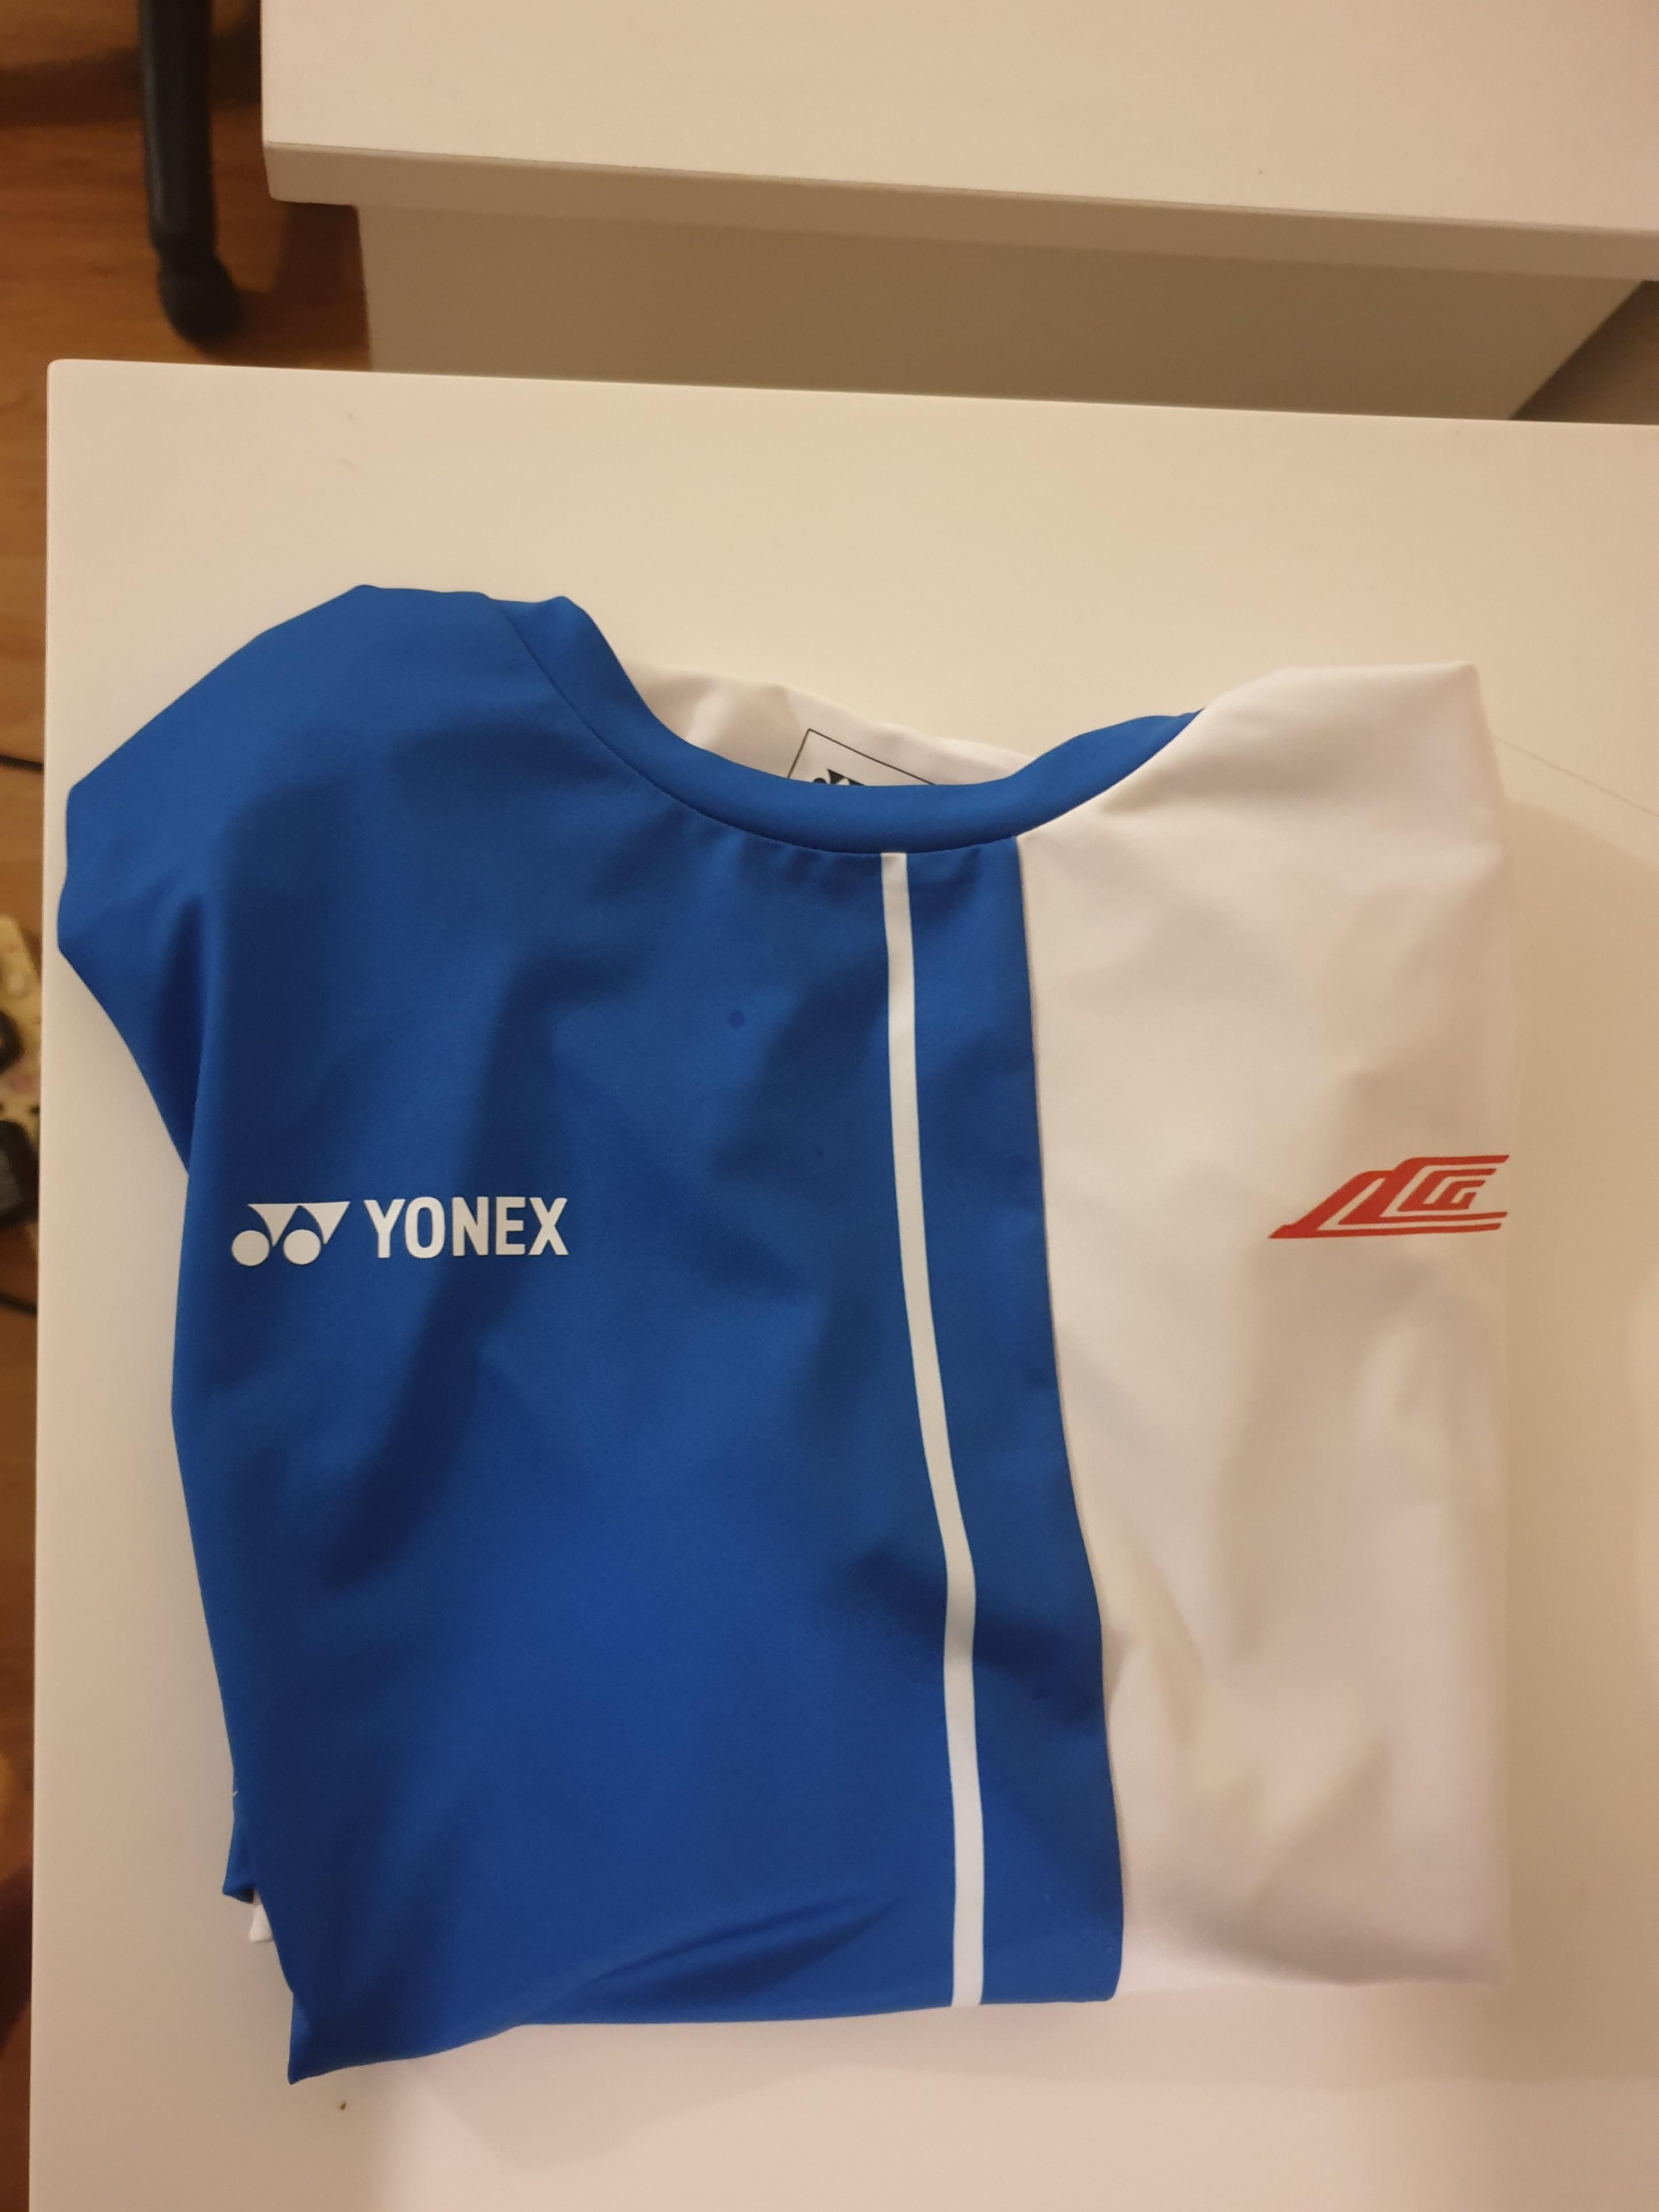 YONEX x Lee Chong Wei x 100 Plus Limited Edition